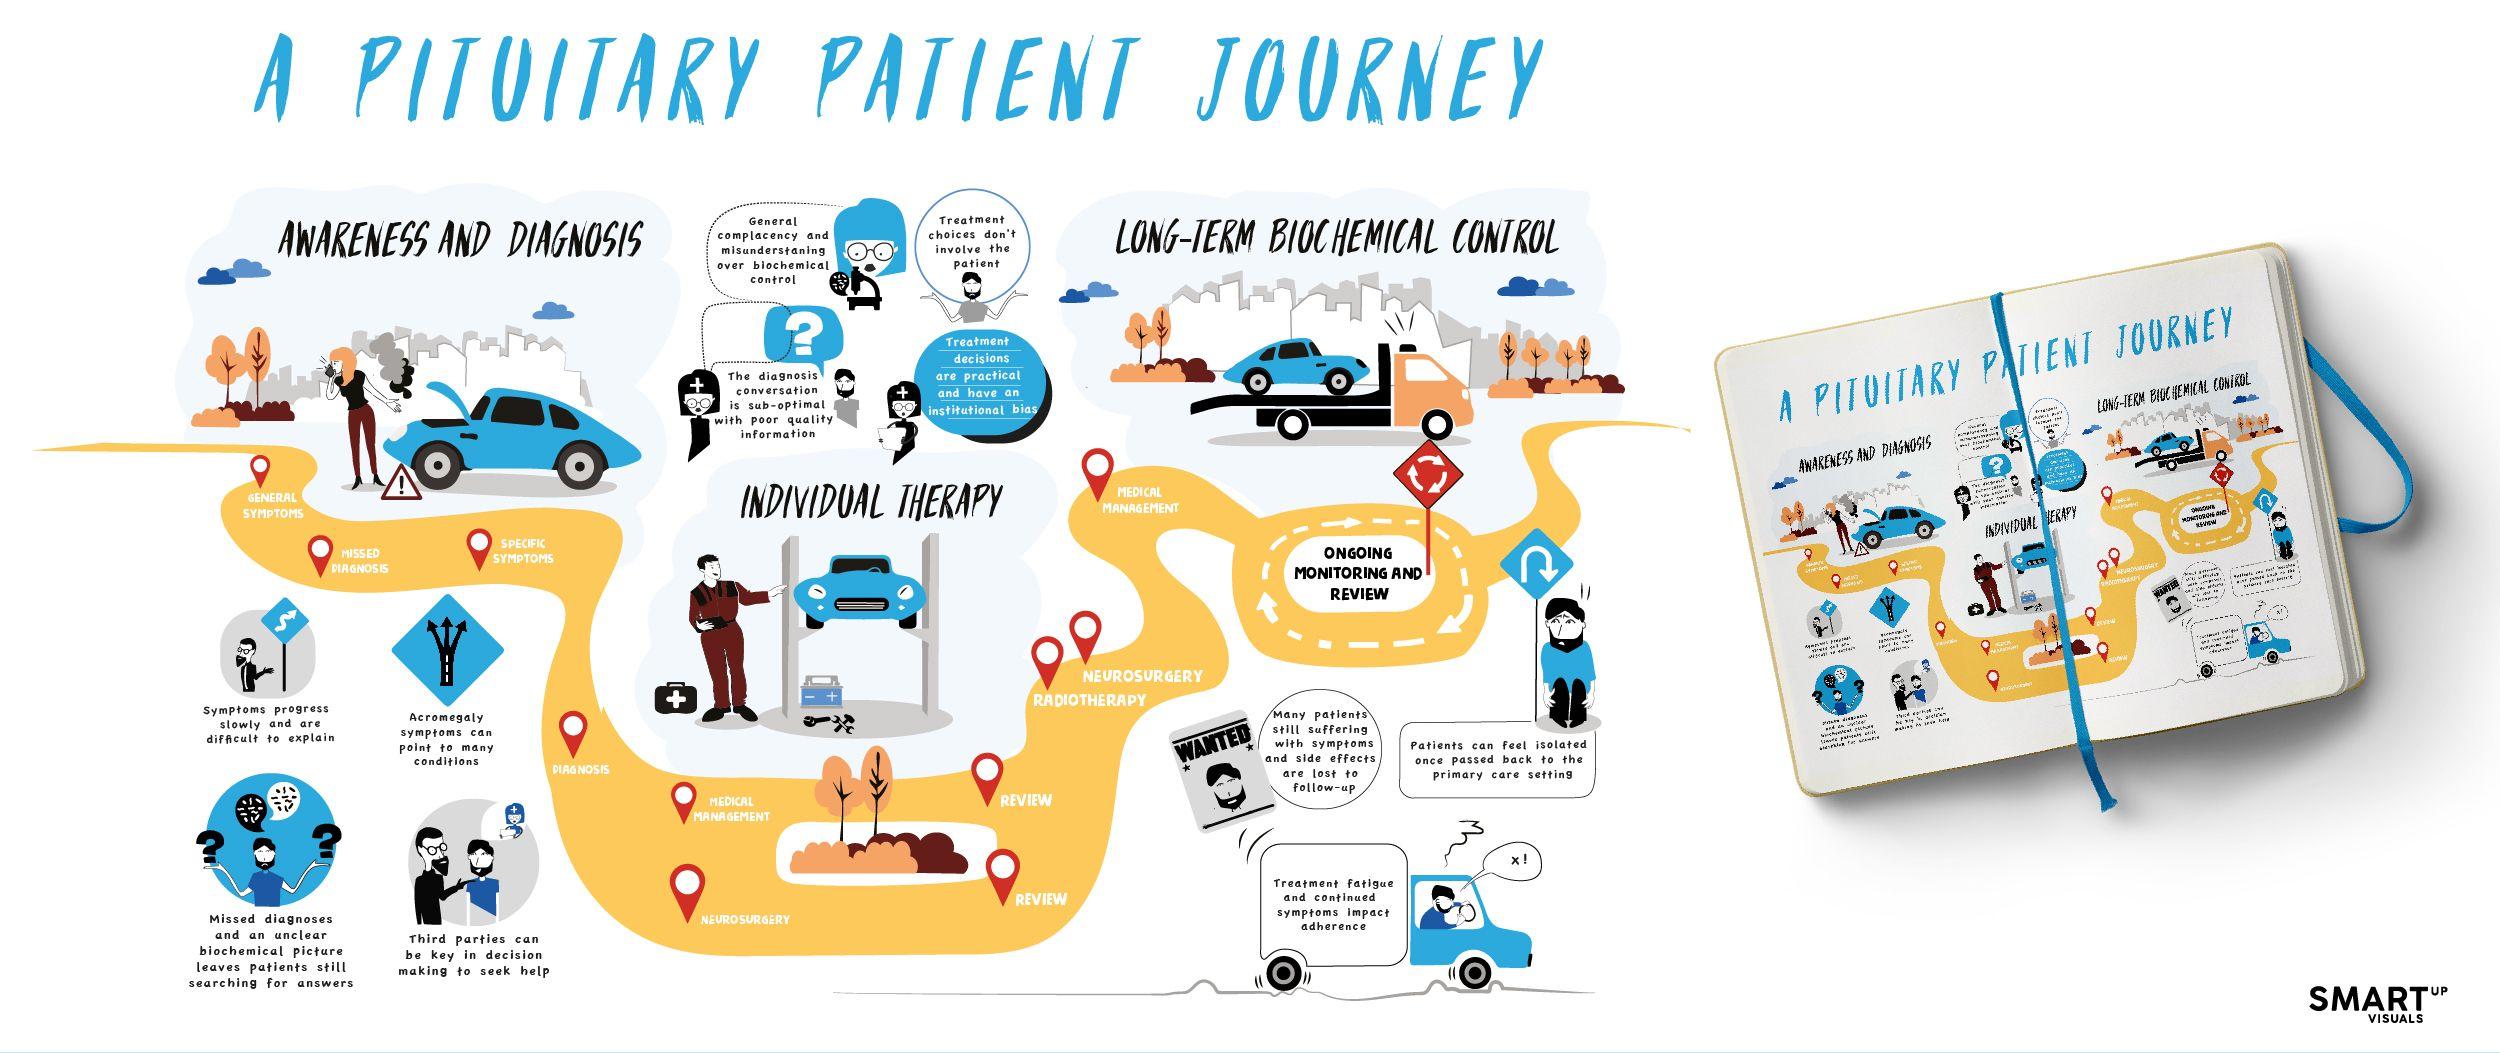 Novartis Customer journey mapping, Journey mapping